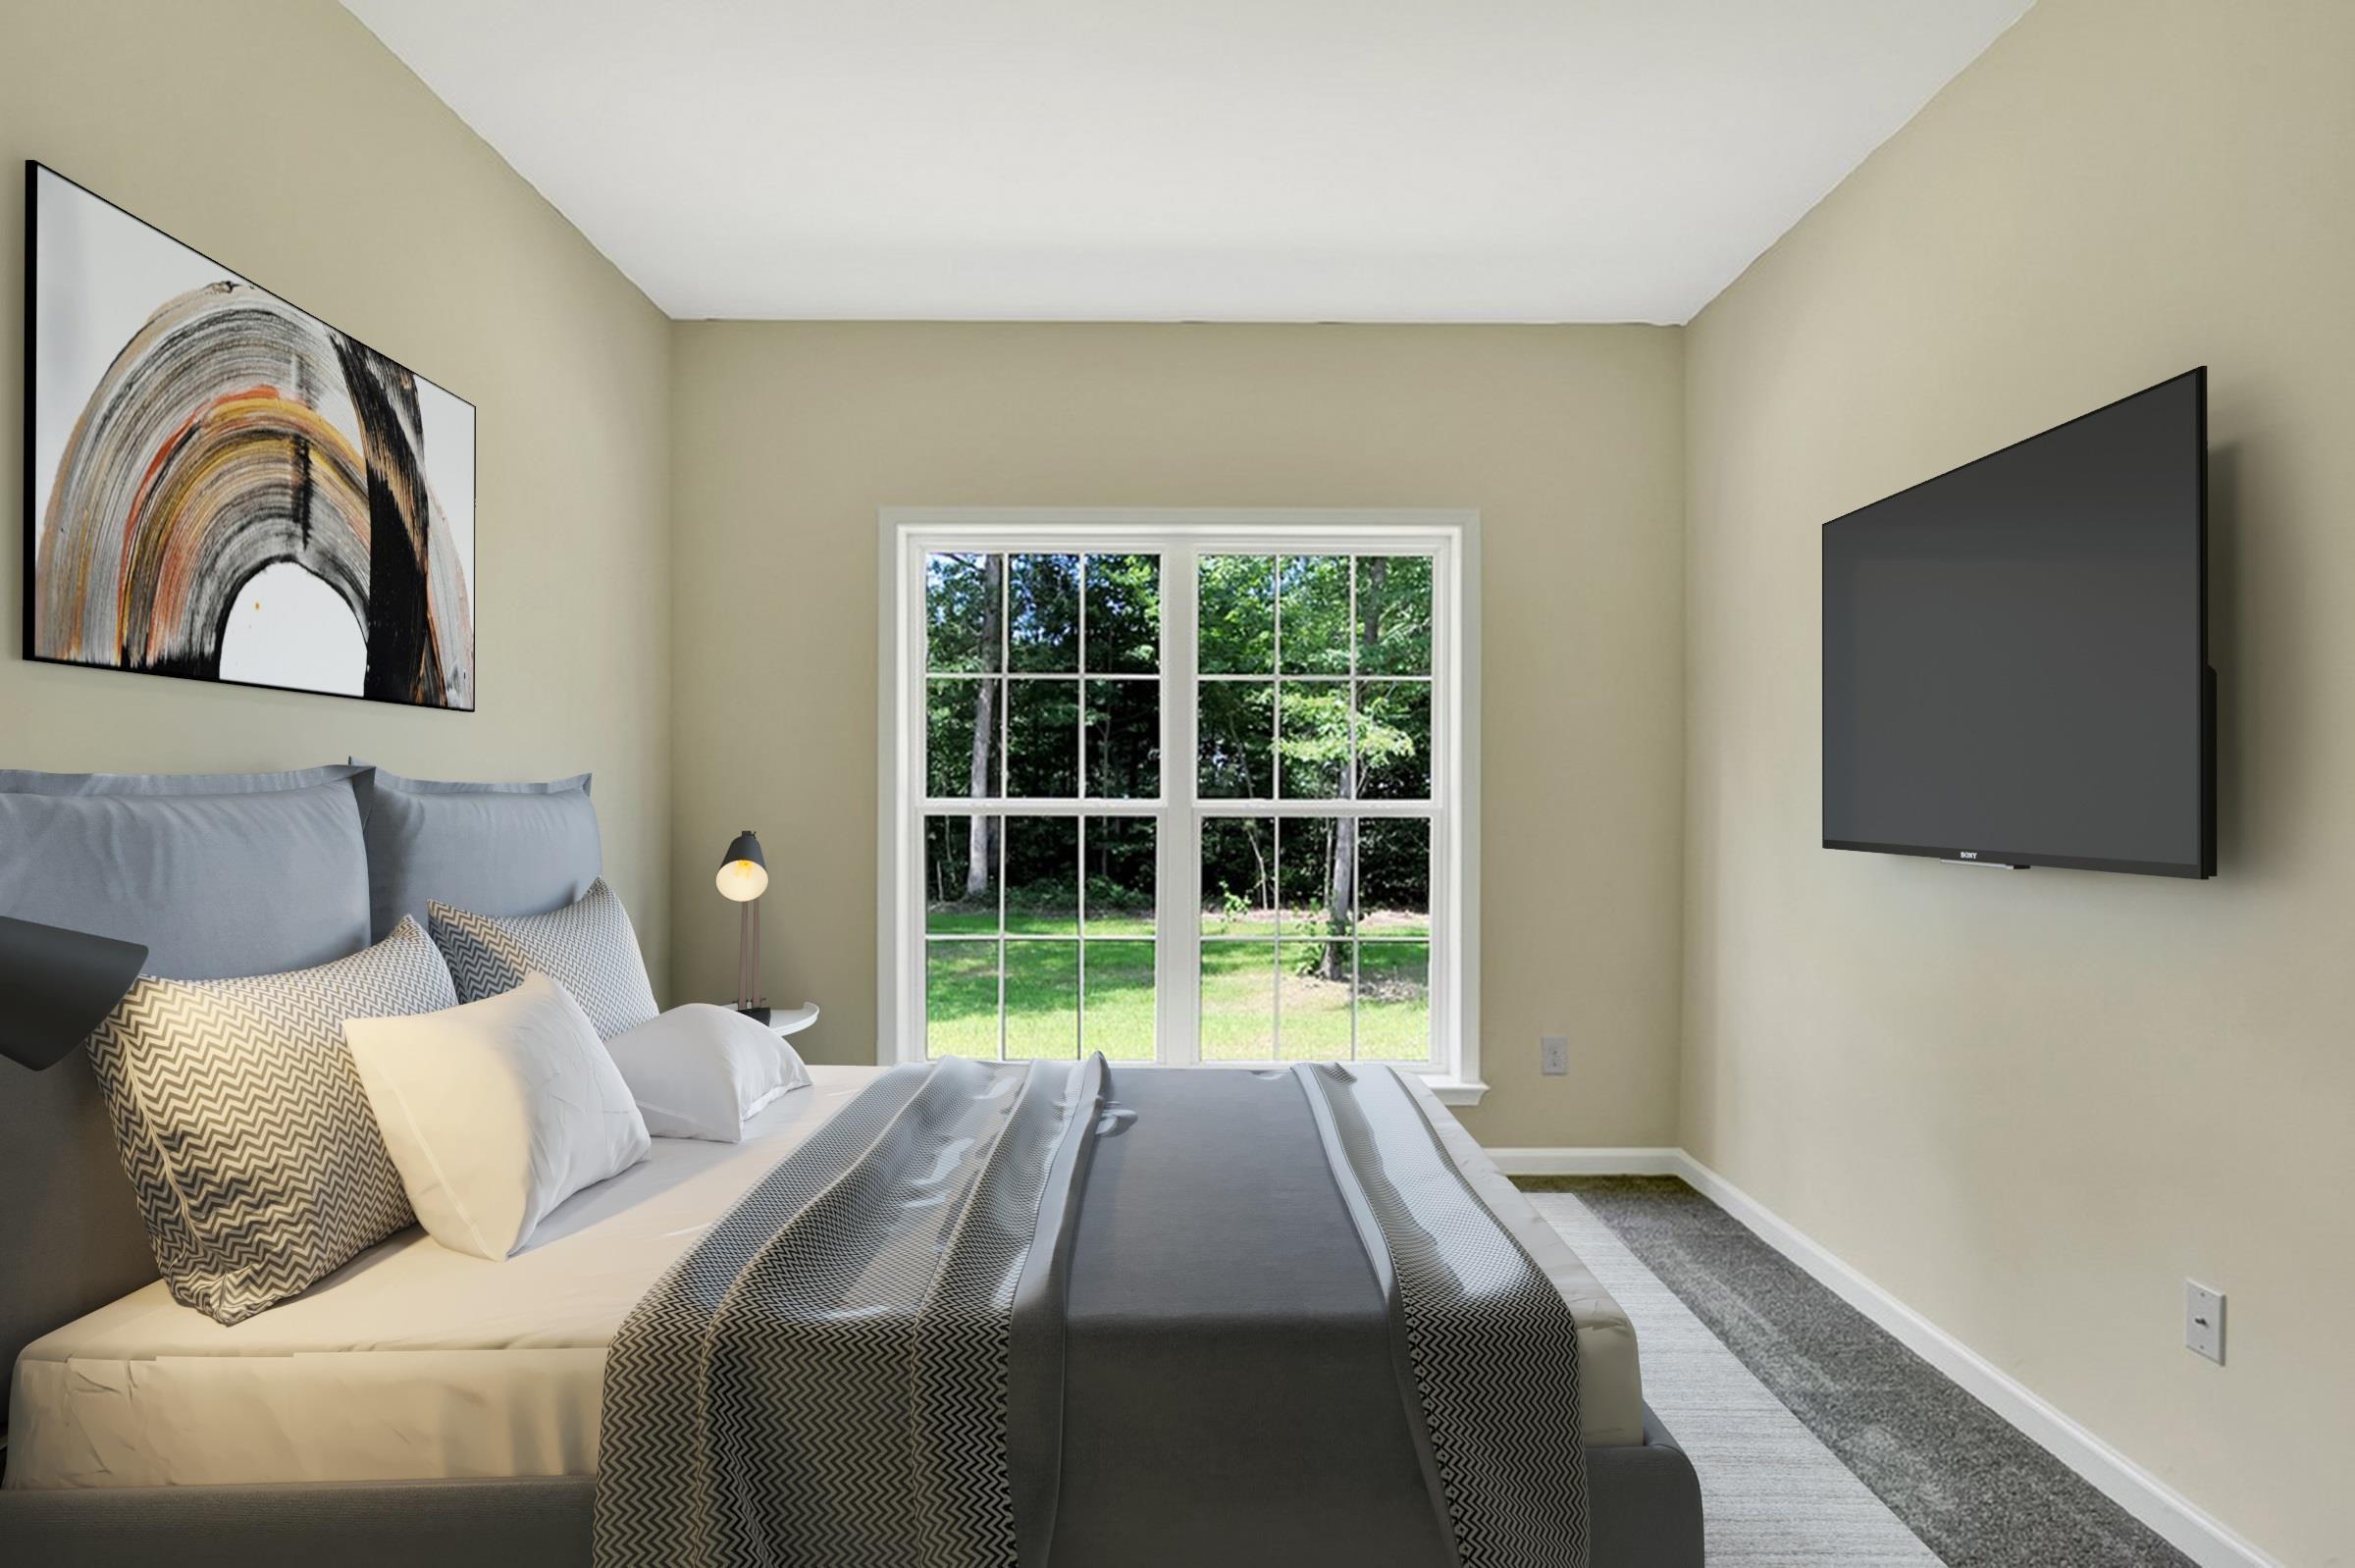 Bedroom featured in The Fenwick By Ashburn Homes in Sussex, DE